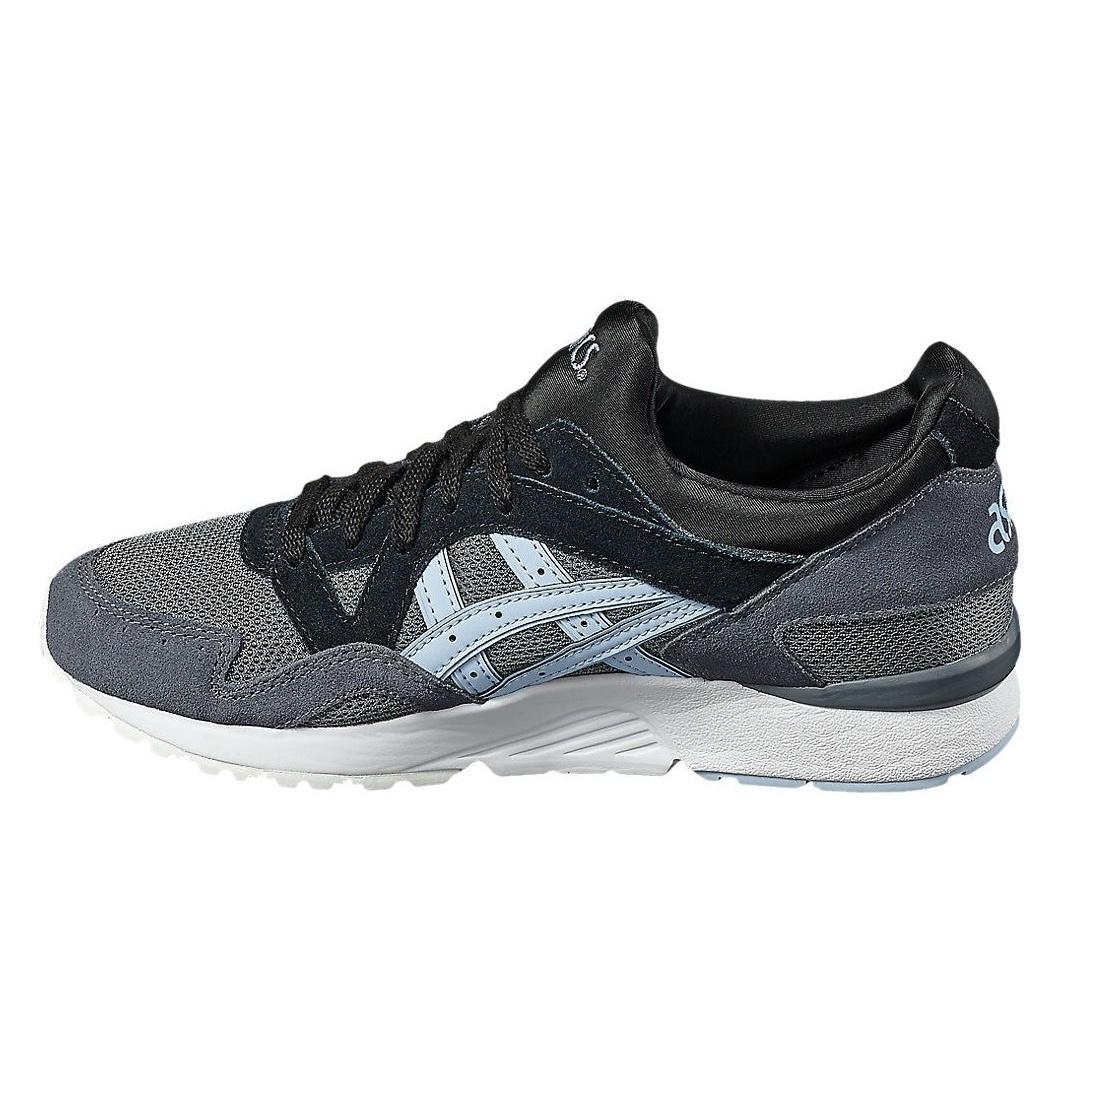 کفش راحتی زنانه اسیکس مدل GEL-LYTE V